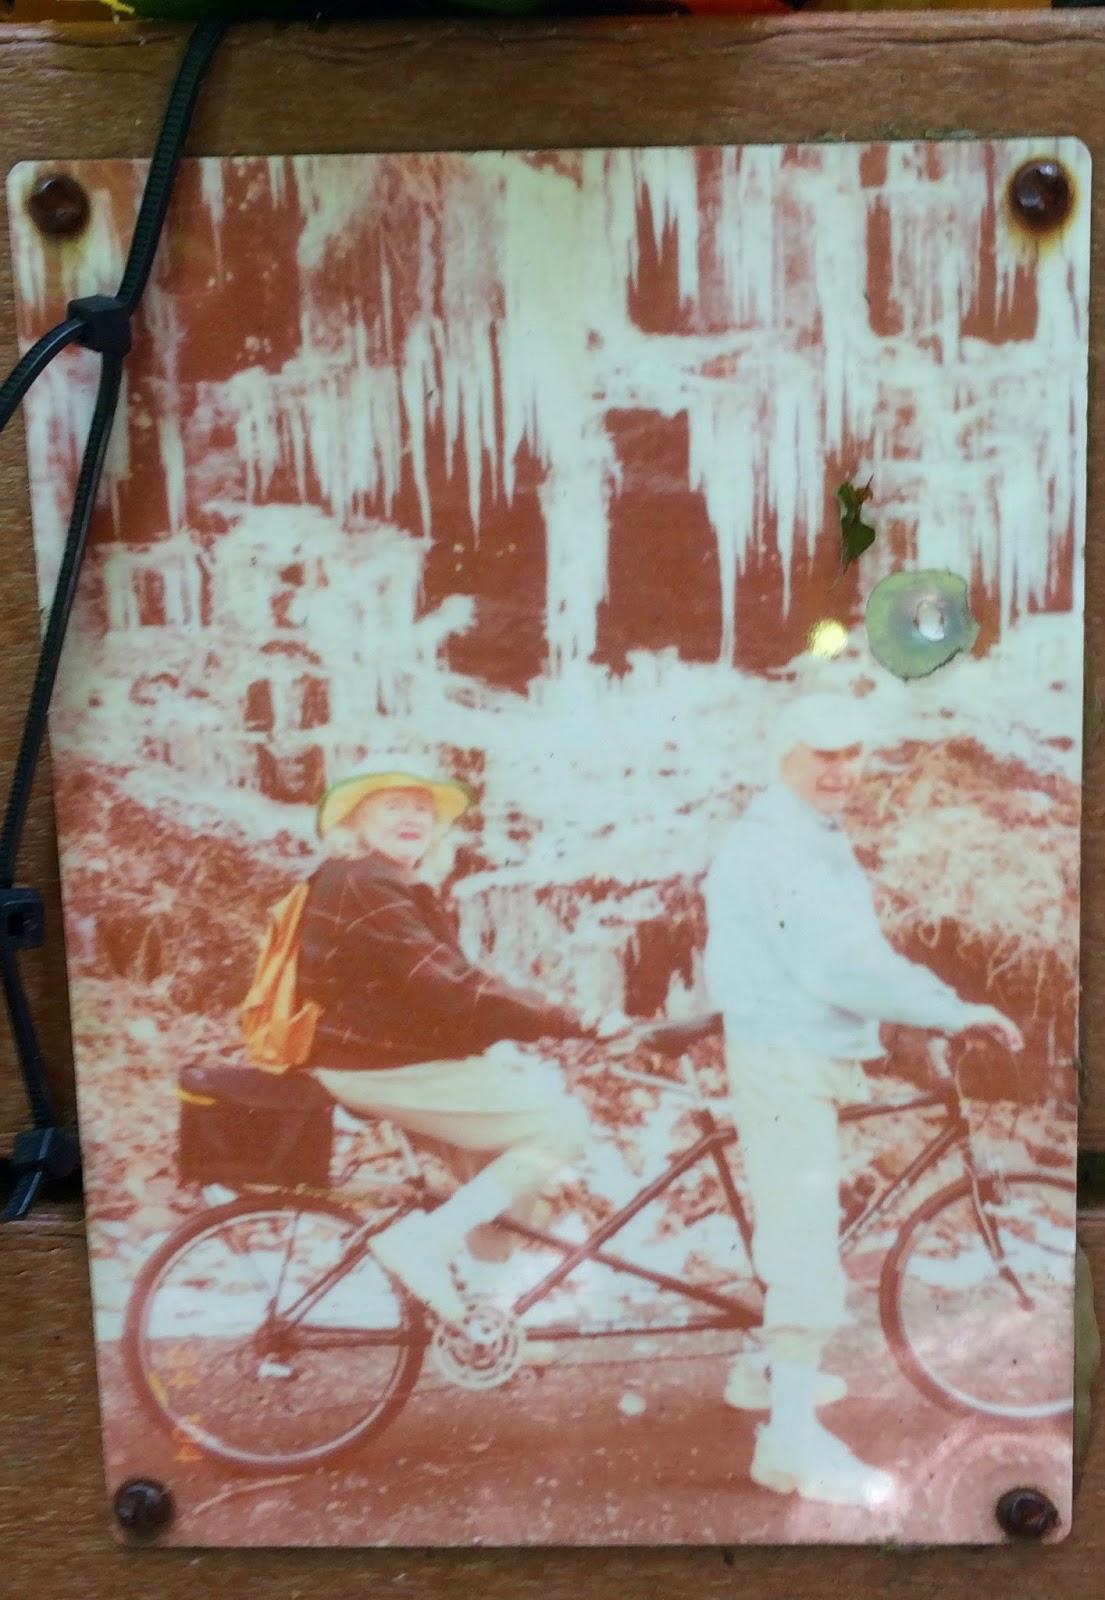 Milspeak creative writing seminar handbook 2009mcws table of contents - Philadelphia Bicycle Journal Hidden Secrets Wife Lover Wallpaper Gallery So Many People Have Been